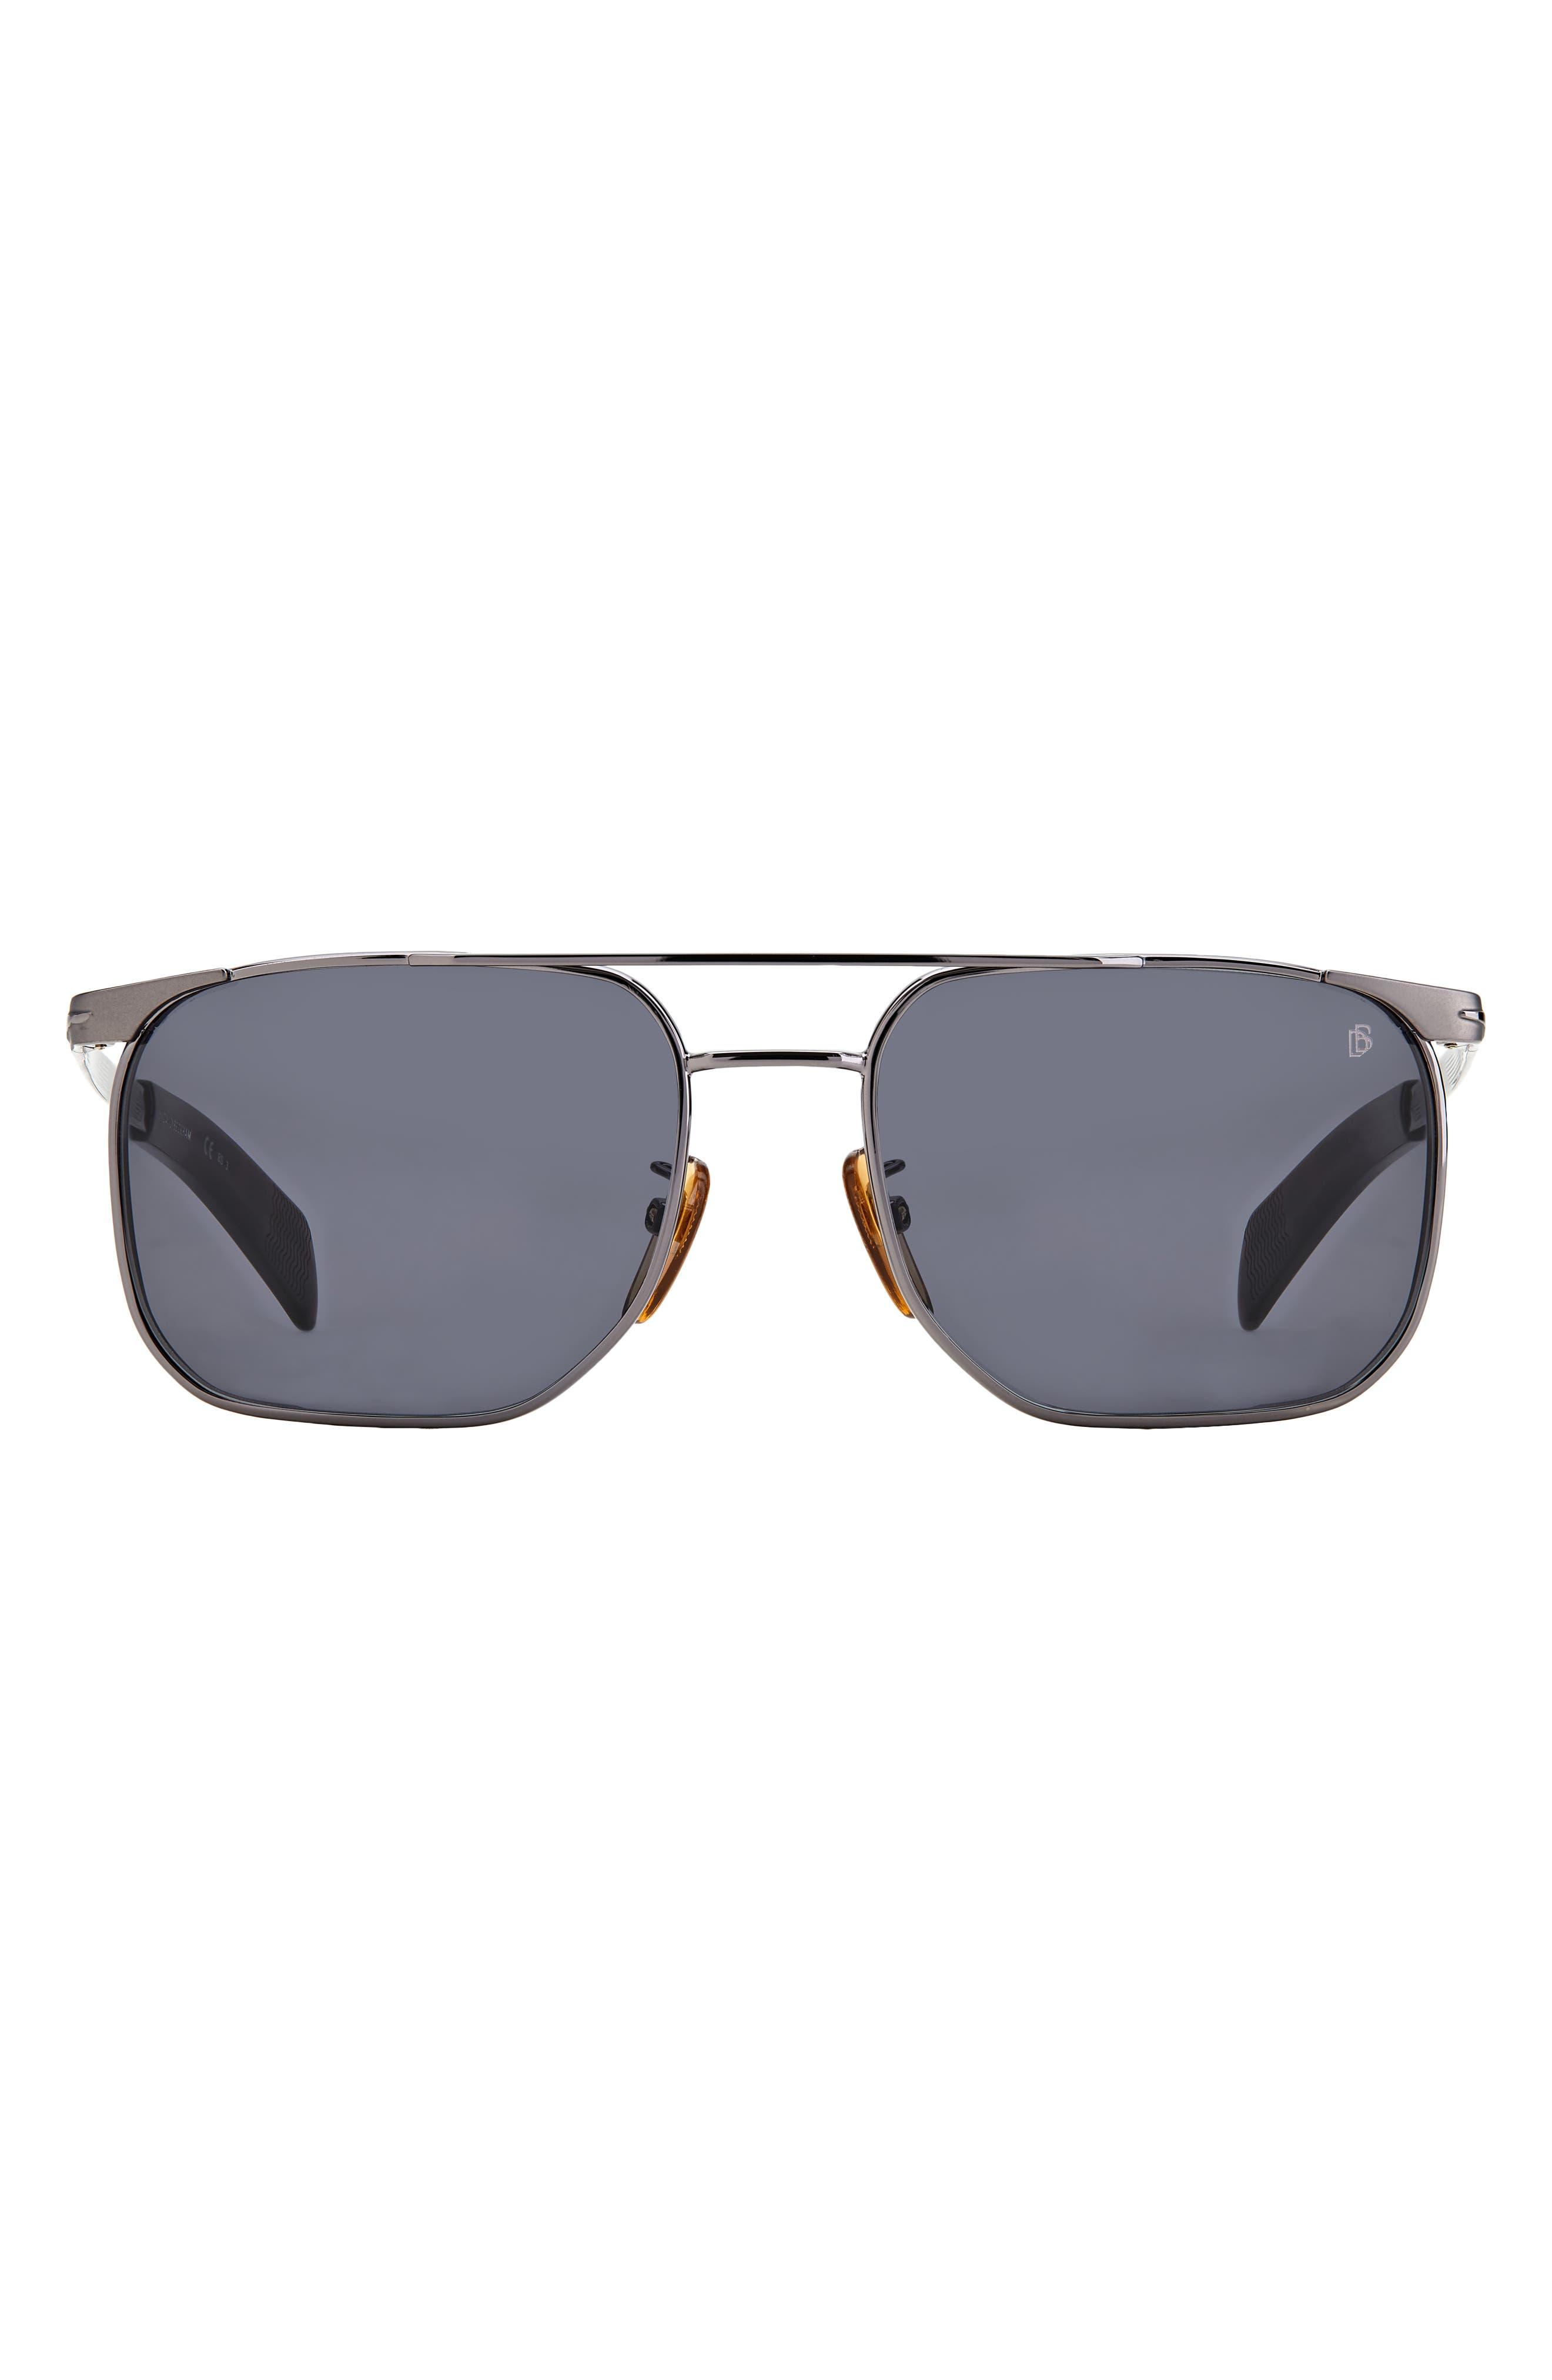 Men's David Beckham 56mm Rectangular Sunglasses